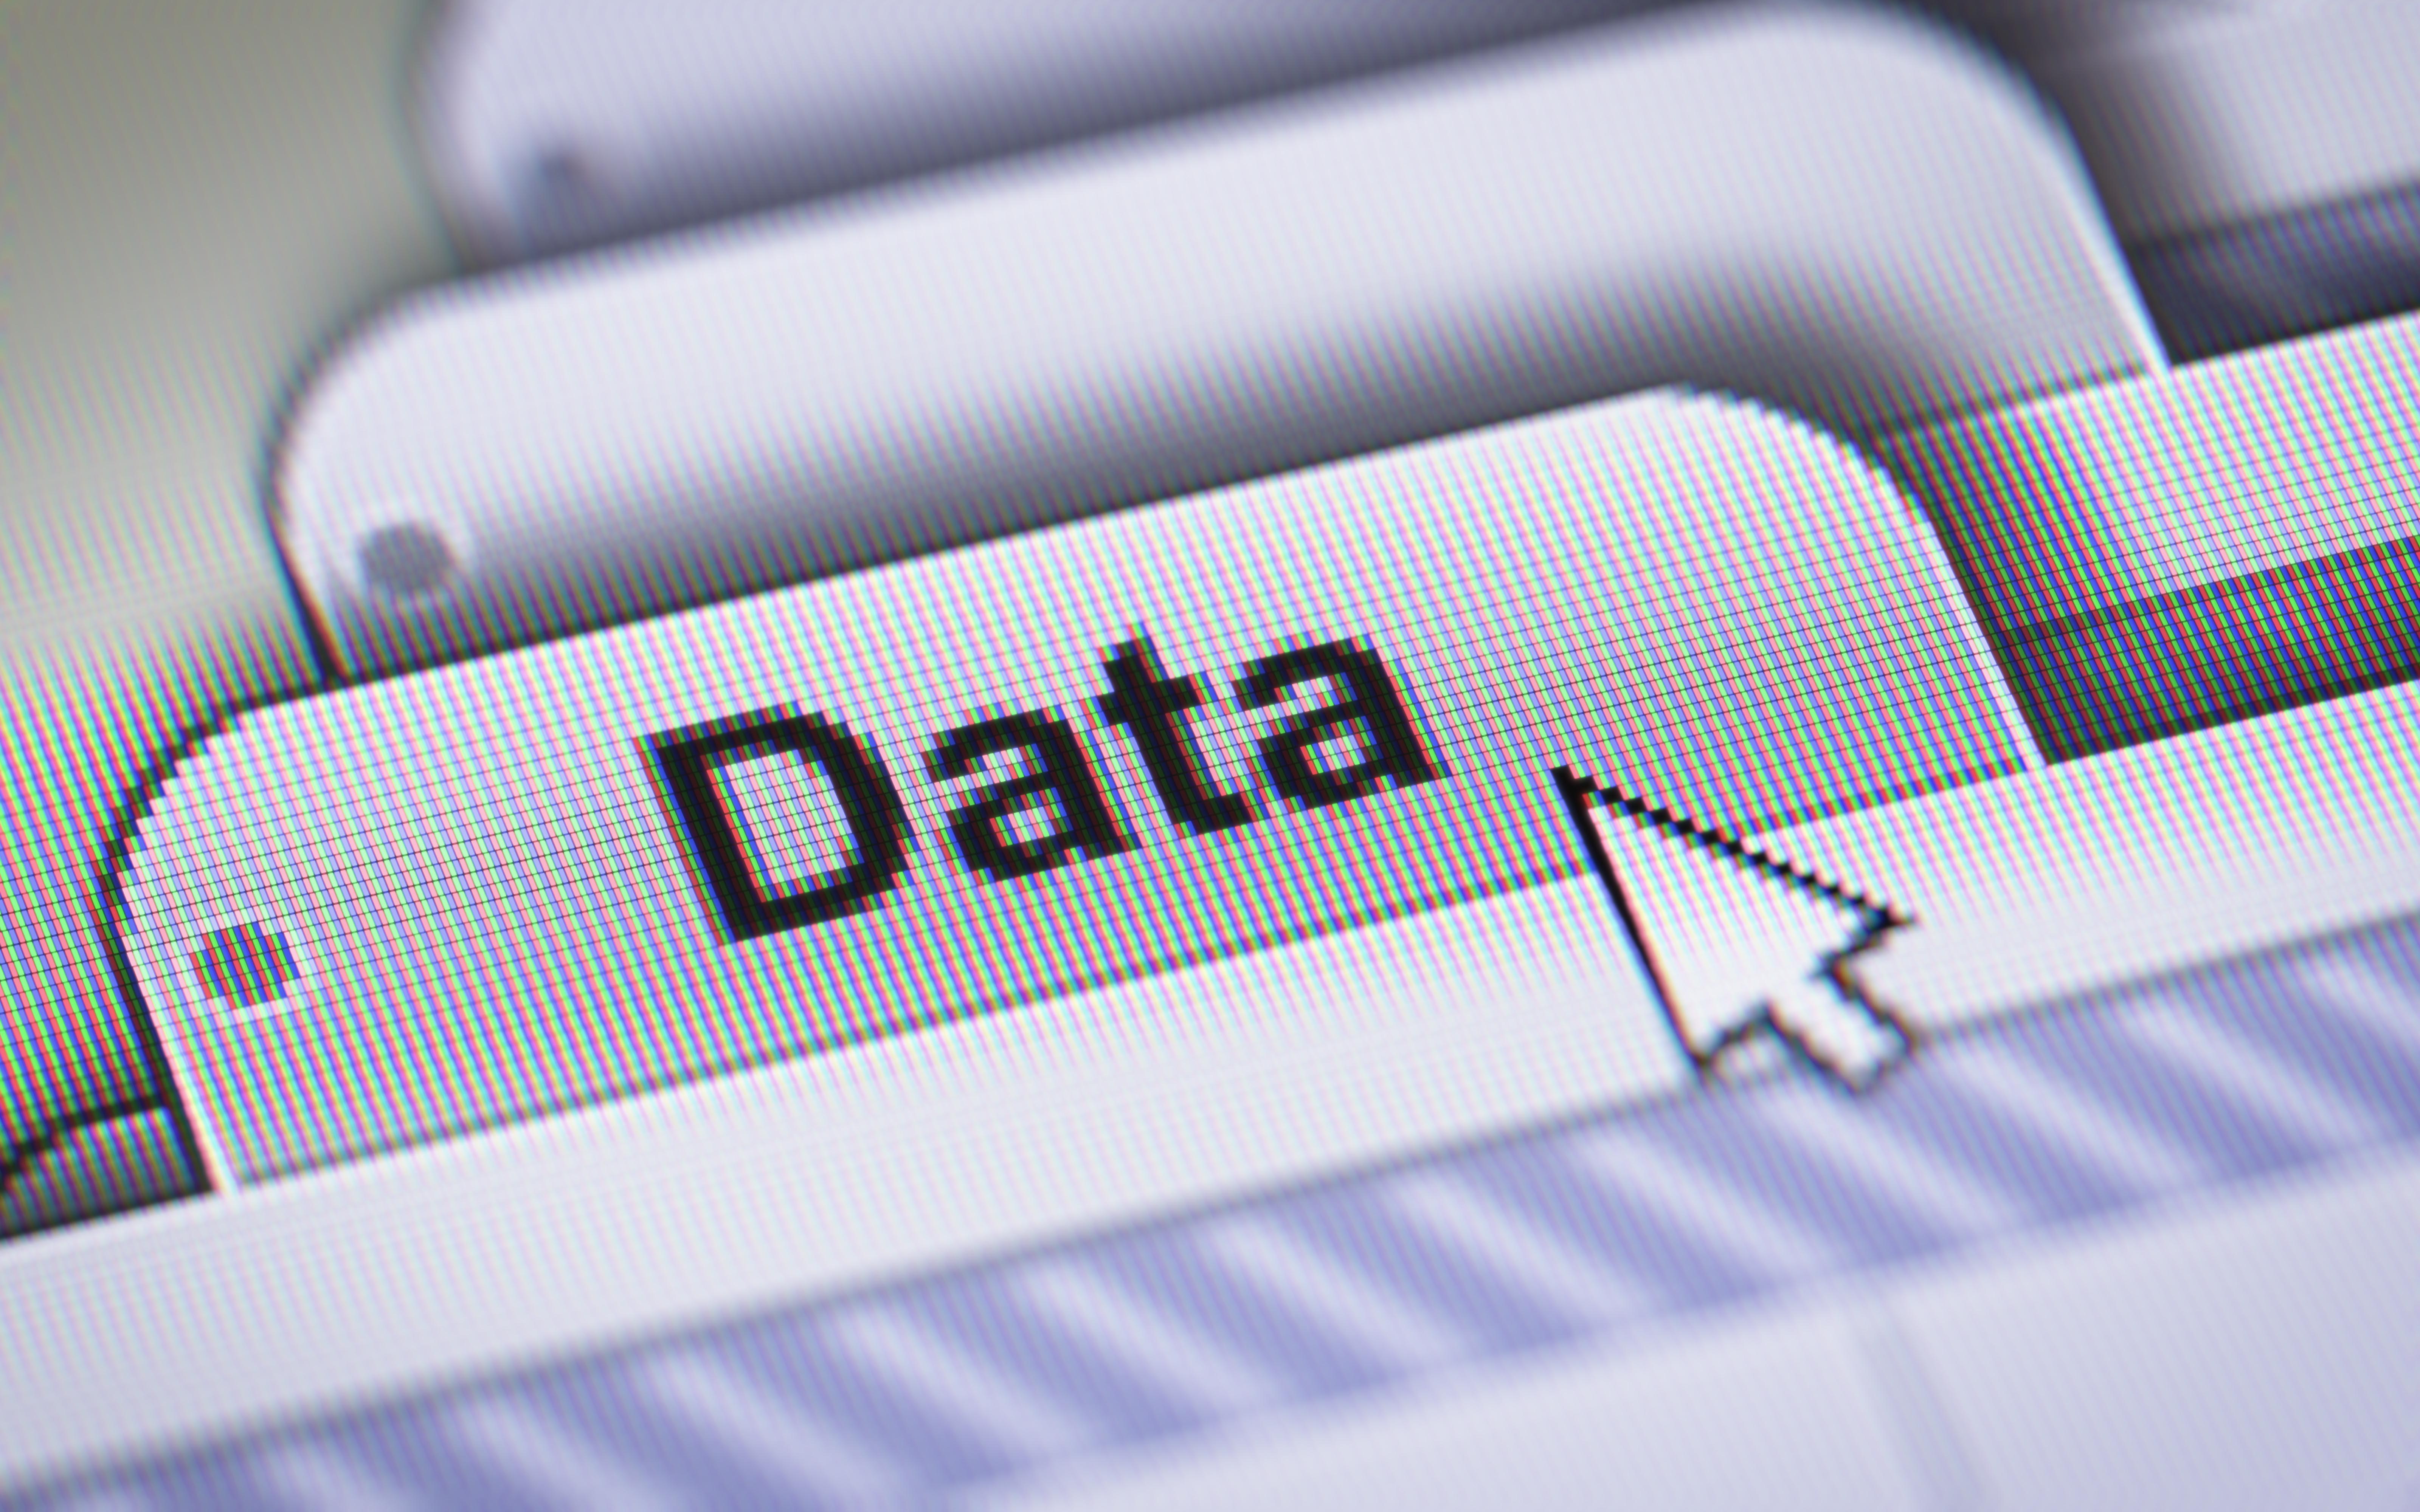 Digging into Data iStock